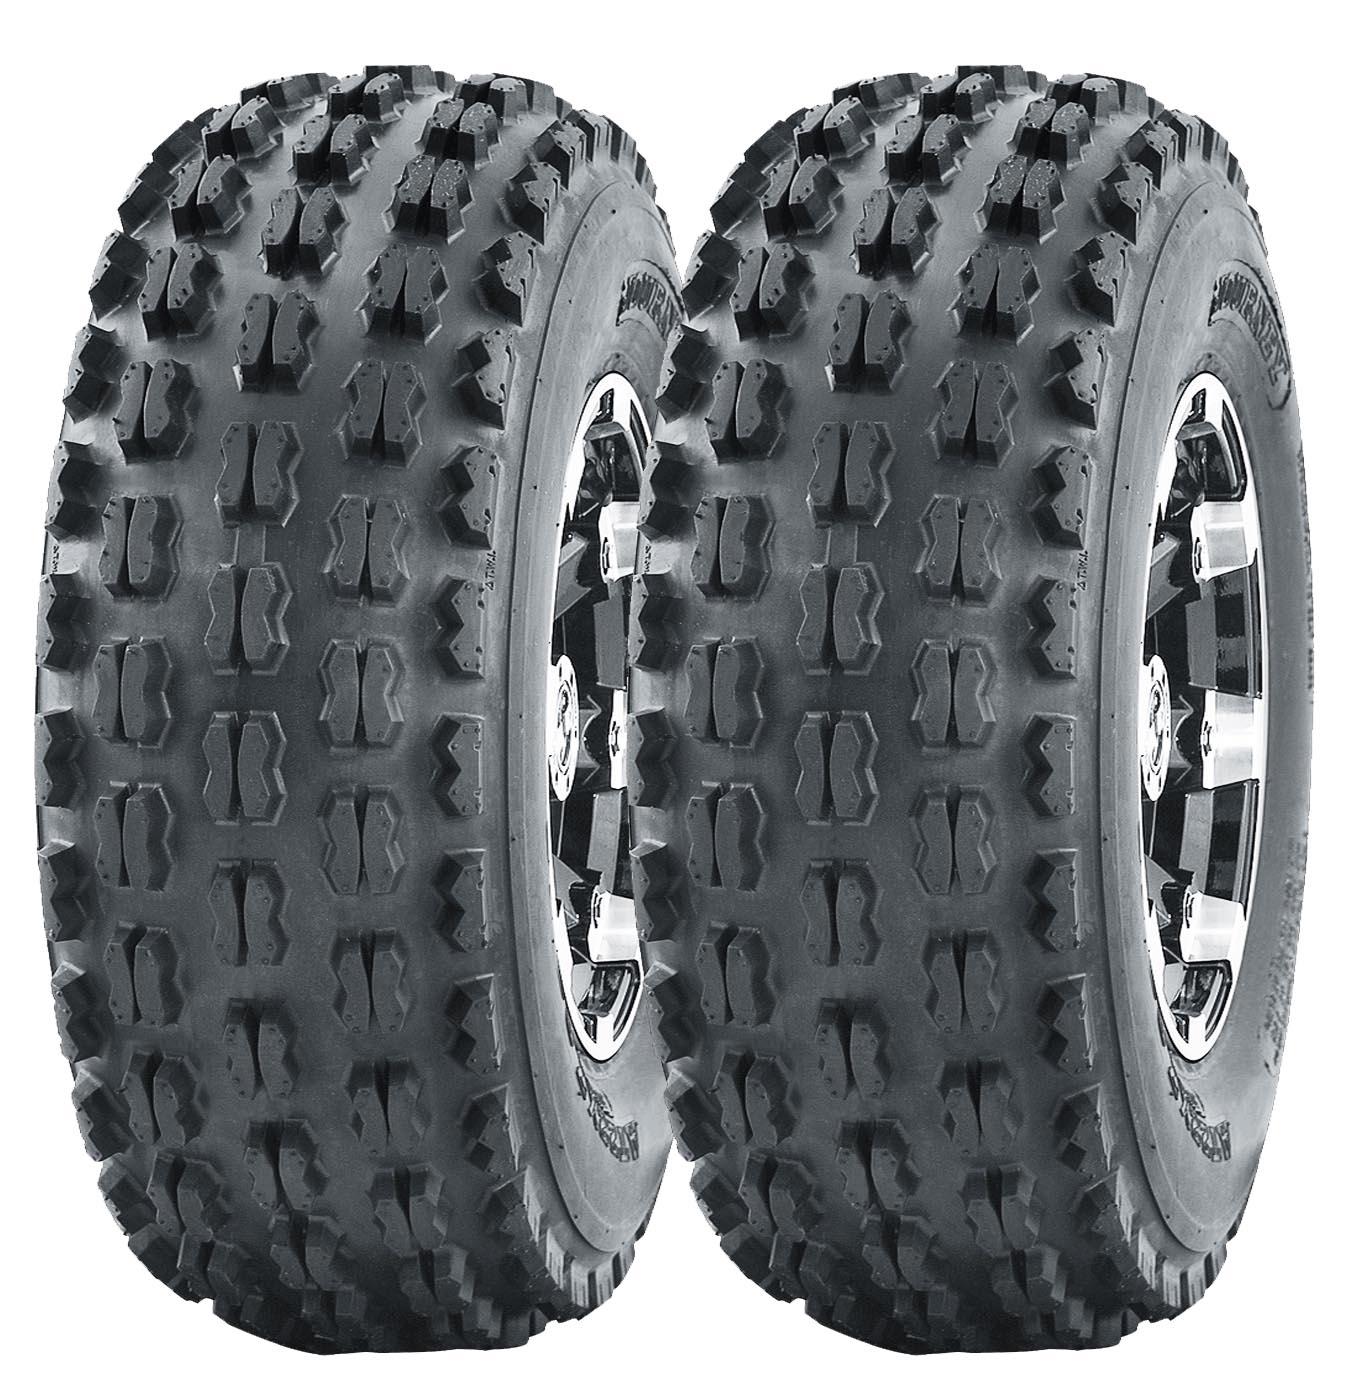 21x7-10 21x7x10 Suzuki Quadsport LT230 250 Z400 ATV Front Tire Set 6PR 2